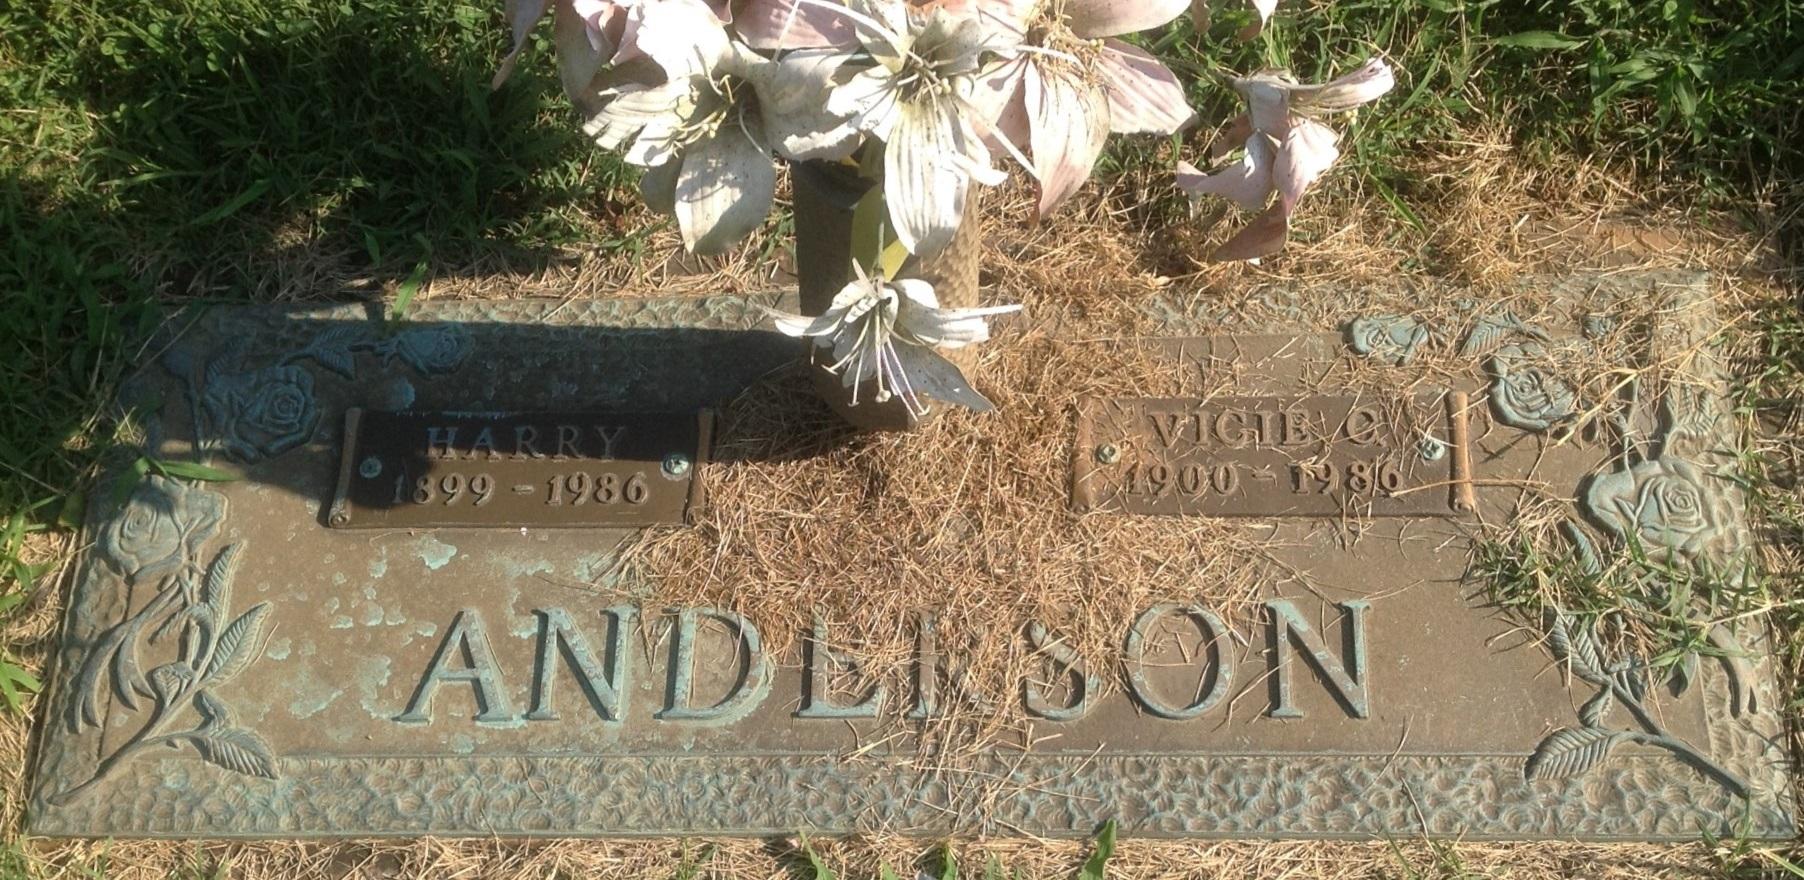 Vicie Corinne Jaco Anderson (1900-1986) - Find A Grave Memorial